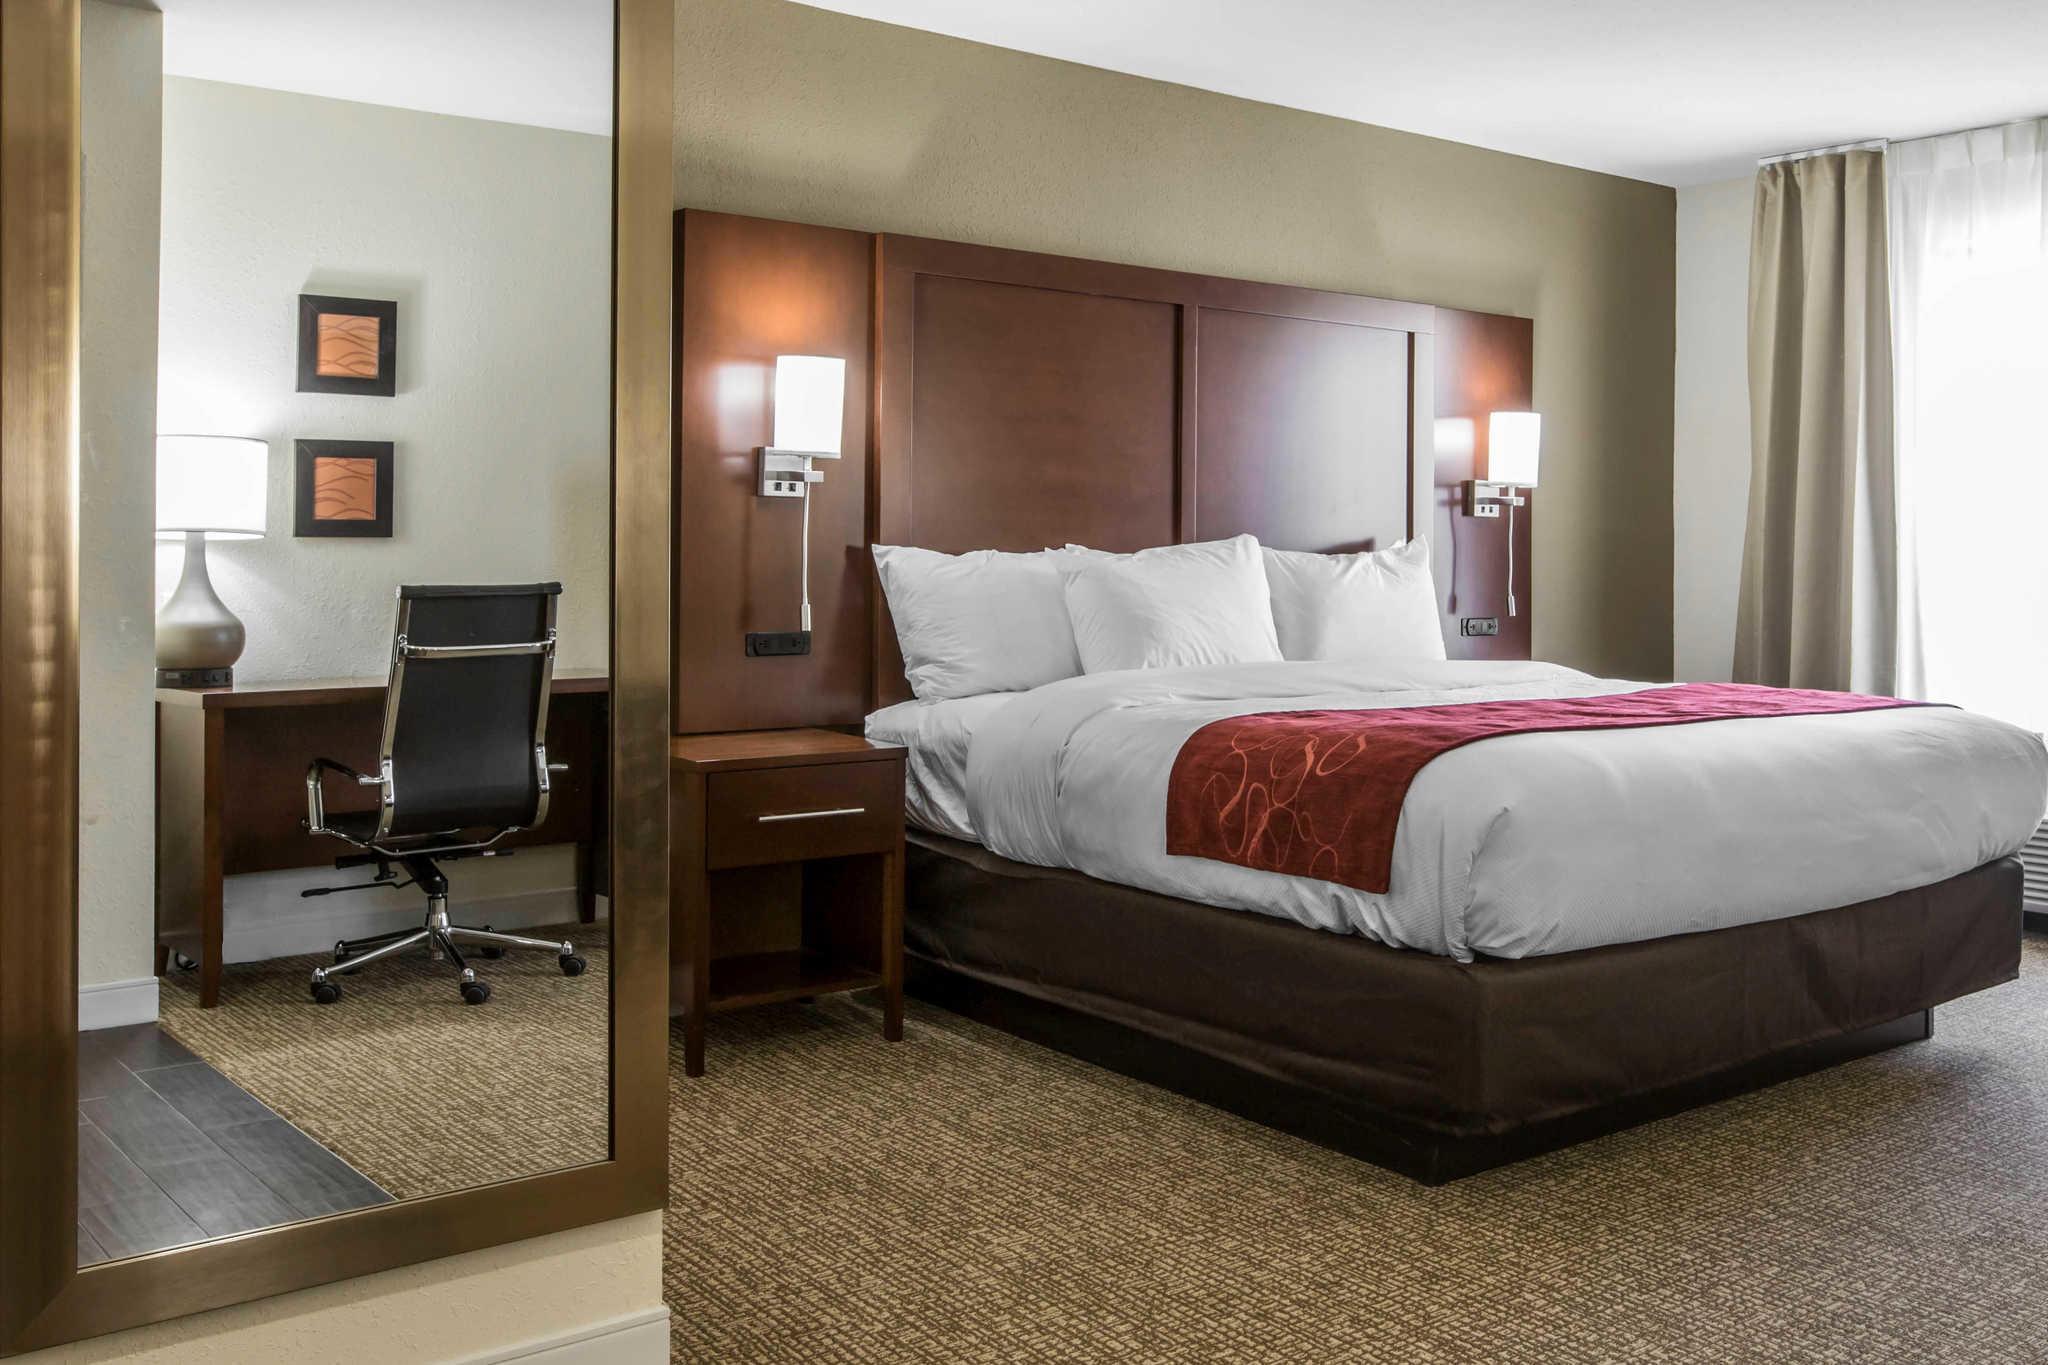 Comfort Inn & Suites West image 23